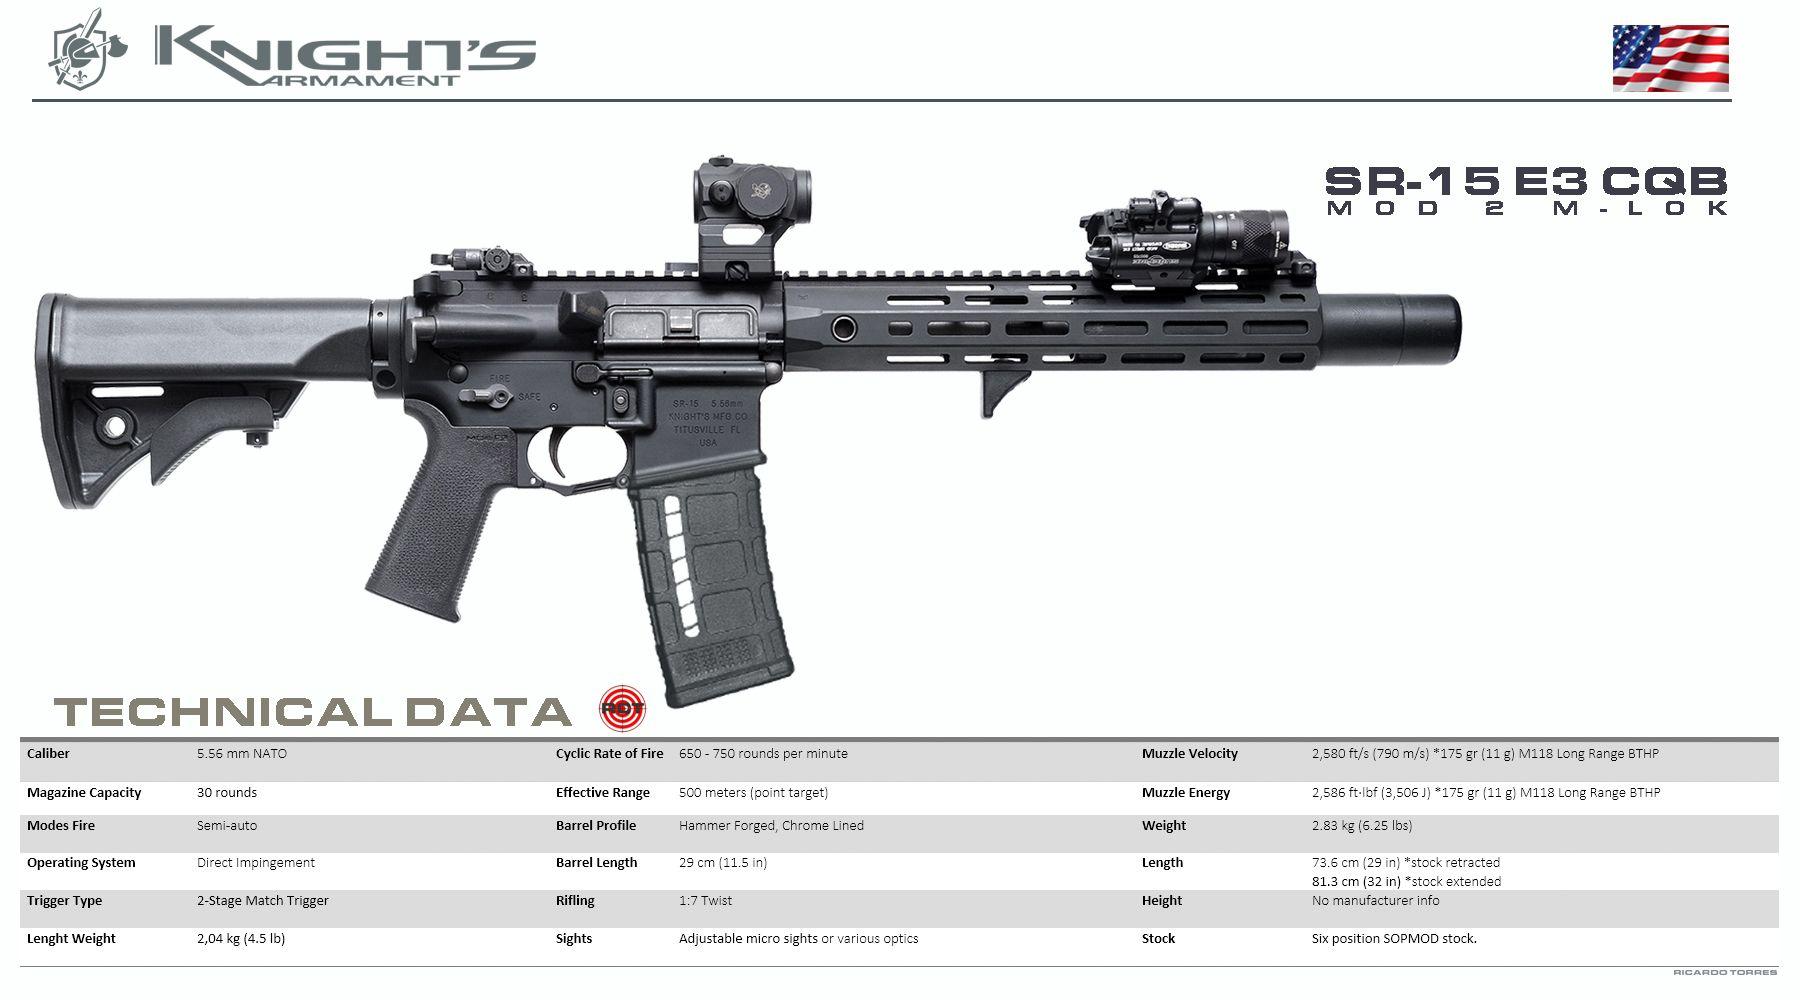 Knight's Armament - SR-15 E3 CQB MOD 2 M-LOK | Guns | Guns